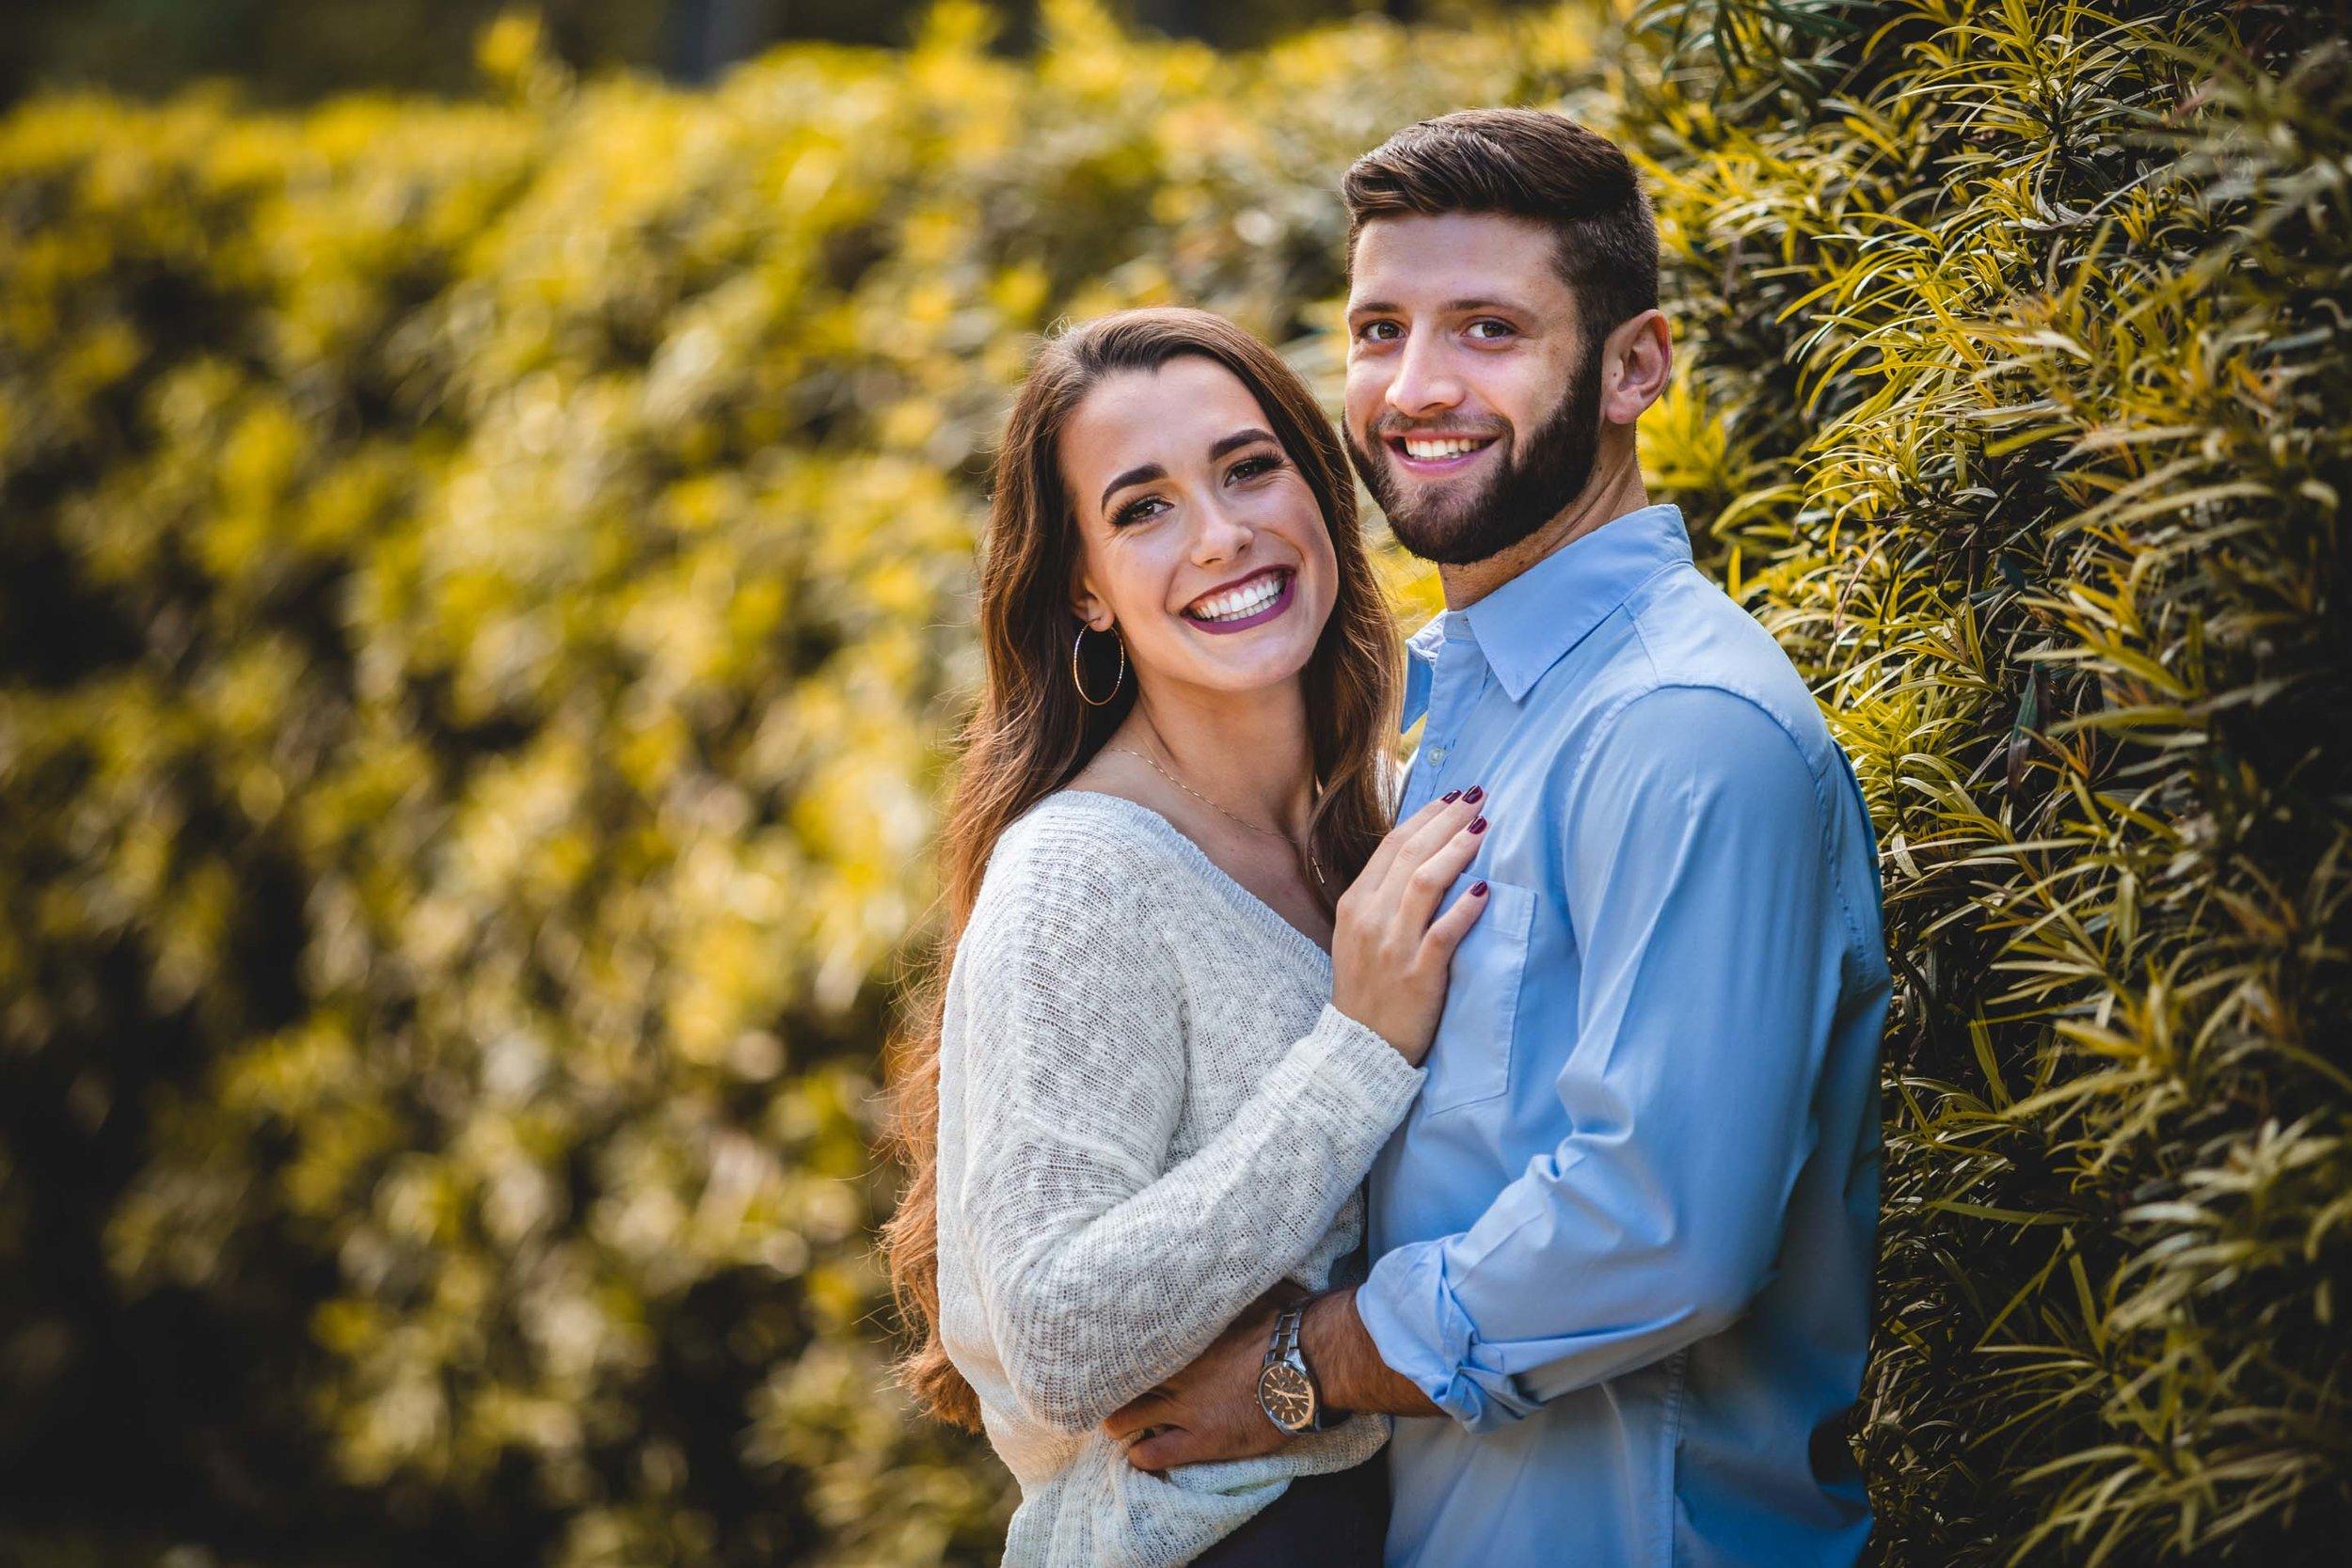 adam-szarmack-jacksonville-wedding-photographer-palm-coast-washing-oaks-garden-state-park-engagement-10.jpg